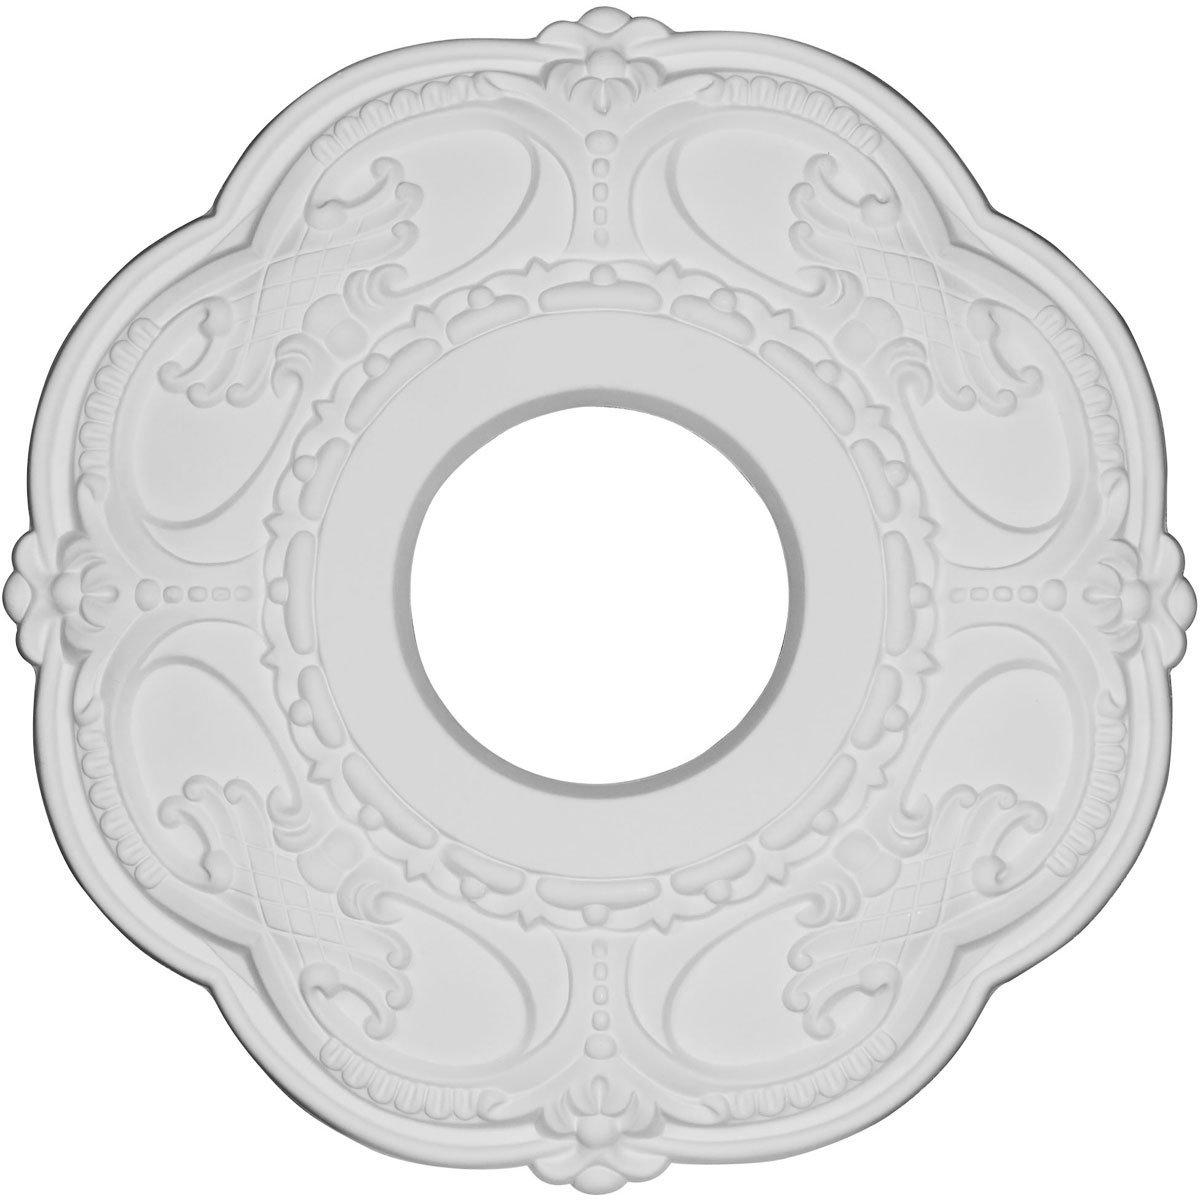 Ekena Millwork CMR12RO 11.5 x 3.5 x 1 in. Rotherham Ceiling Medallion Primed